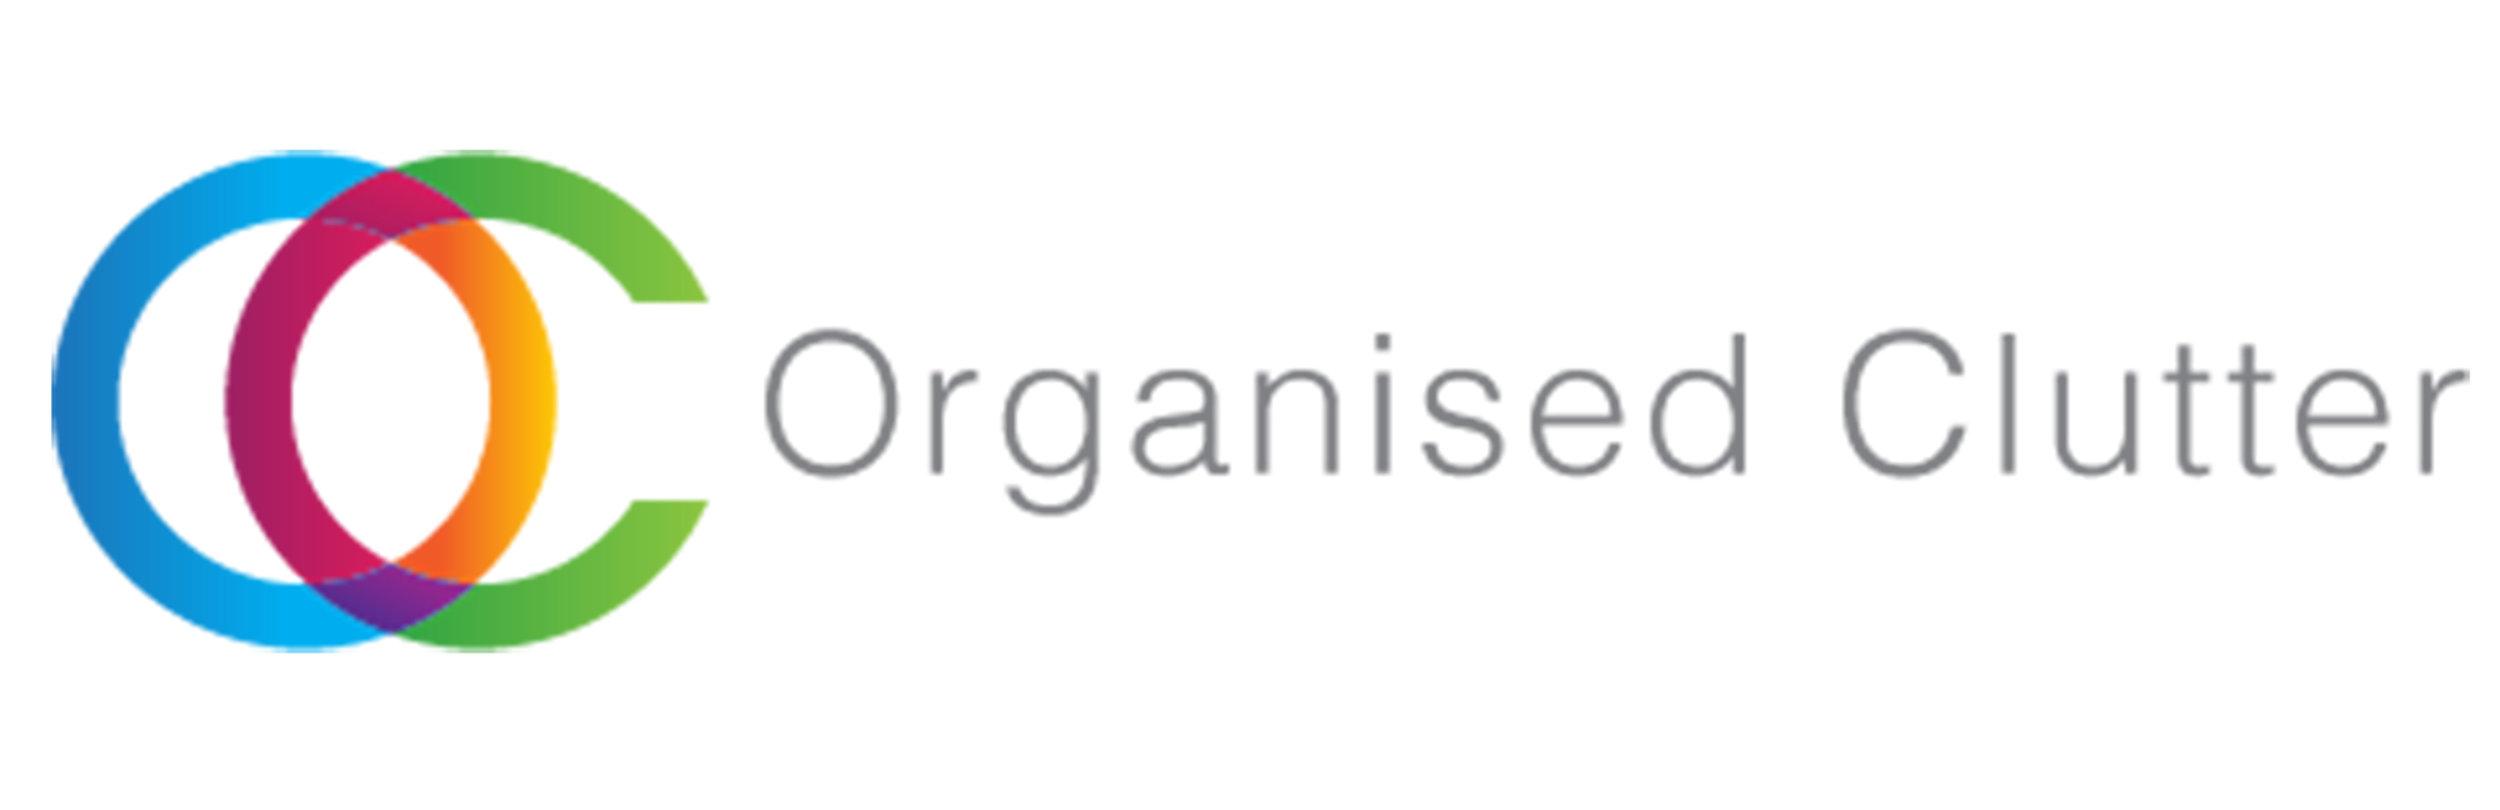 Organised Clutter Logo Lscape.jpg